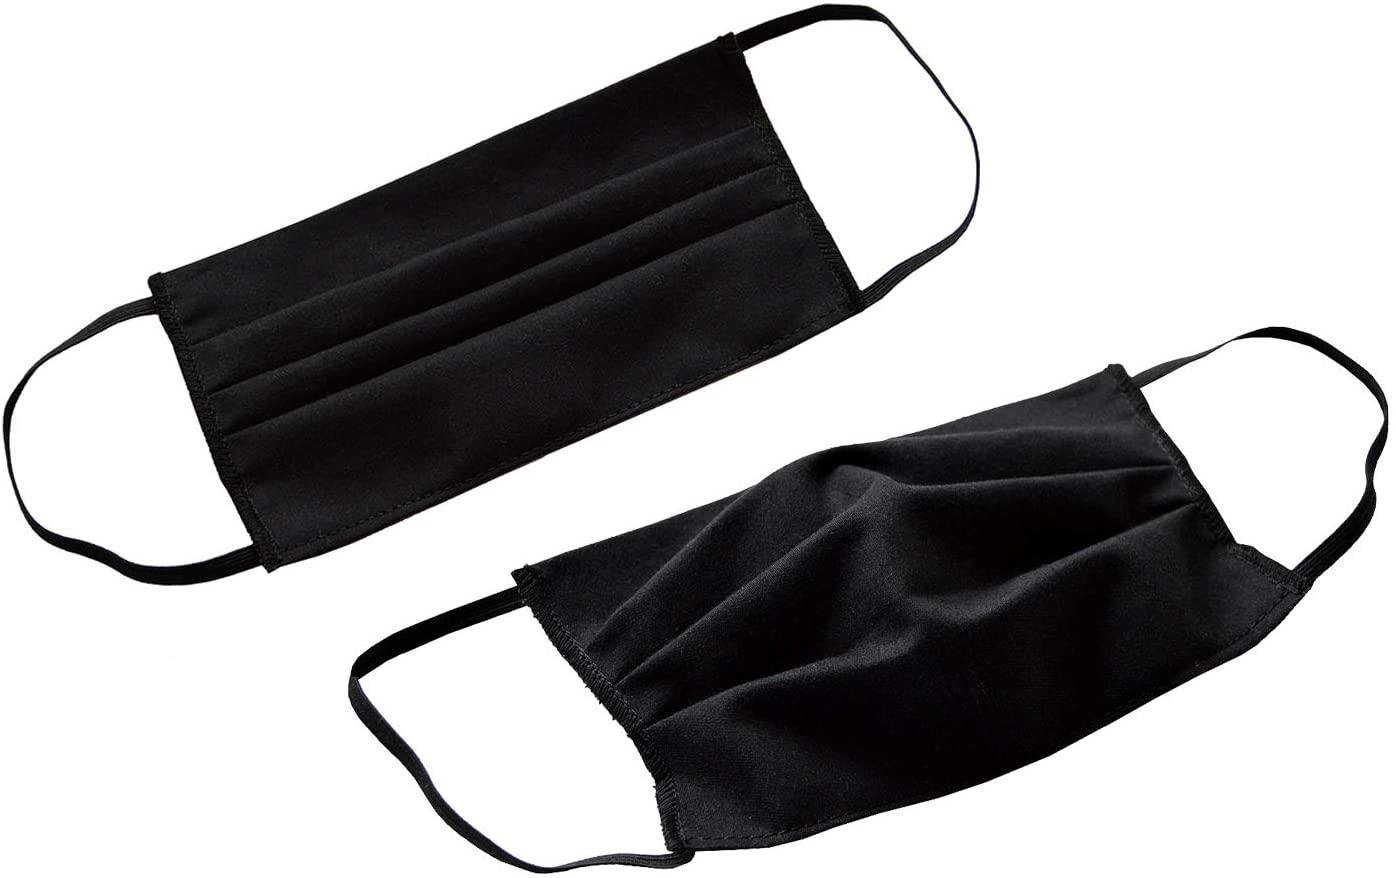 BambiniWelt Mund-Nasen-Maske Gesichtsmaske